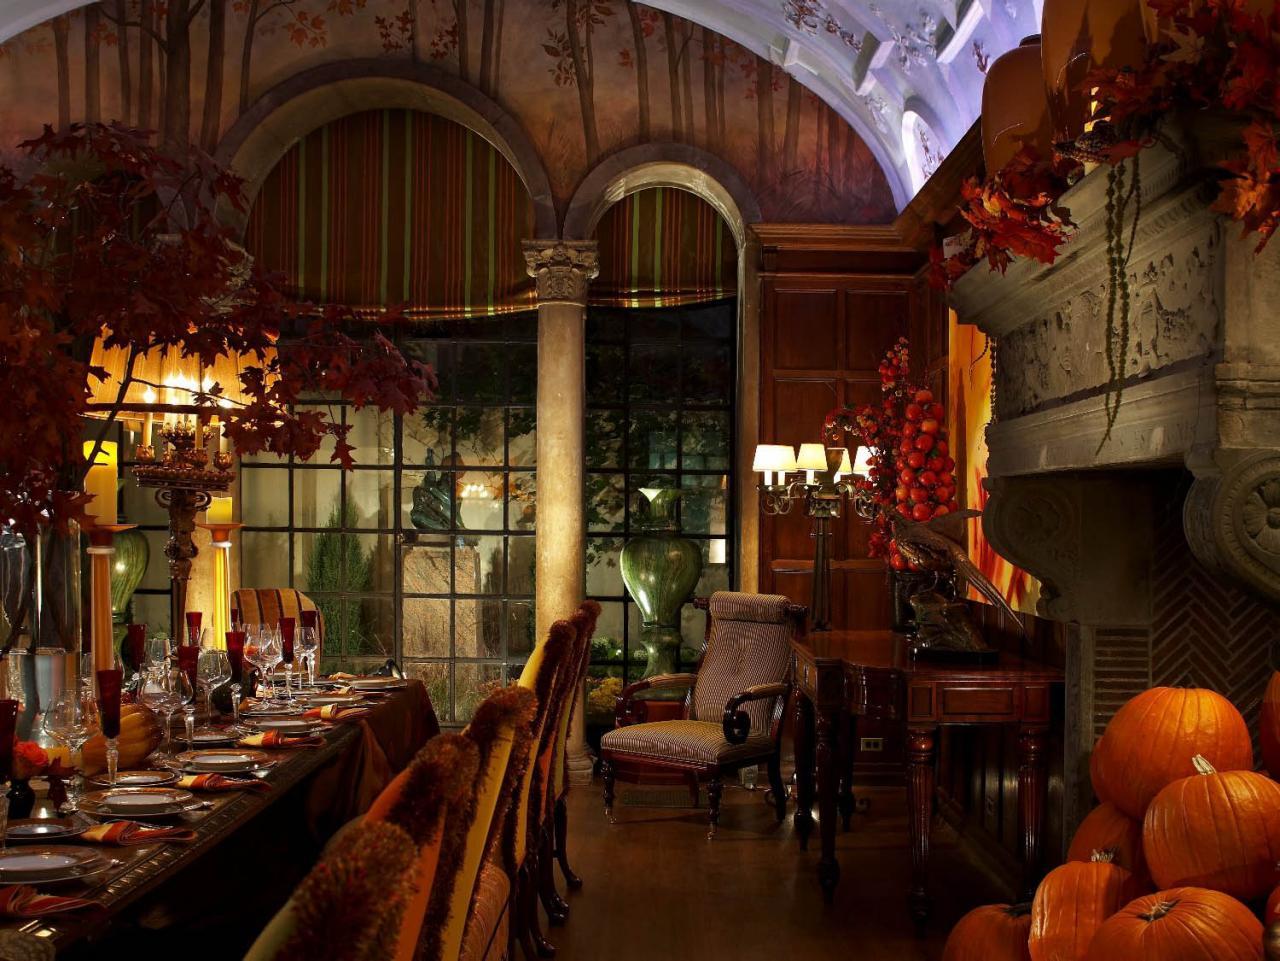 the living room restaurant ennis 28 images c bar 3  : 1400980732276 from wallpapersist.com size 1280 x 960 jpeg 184kB